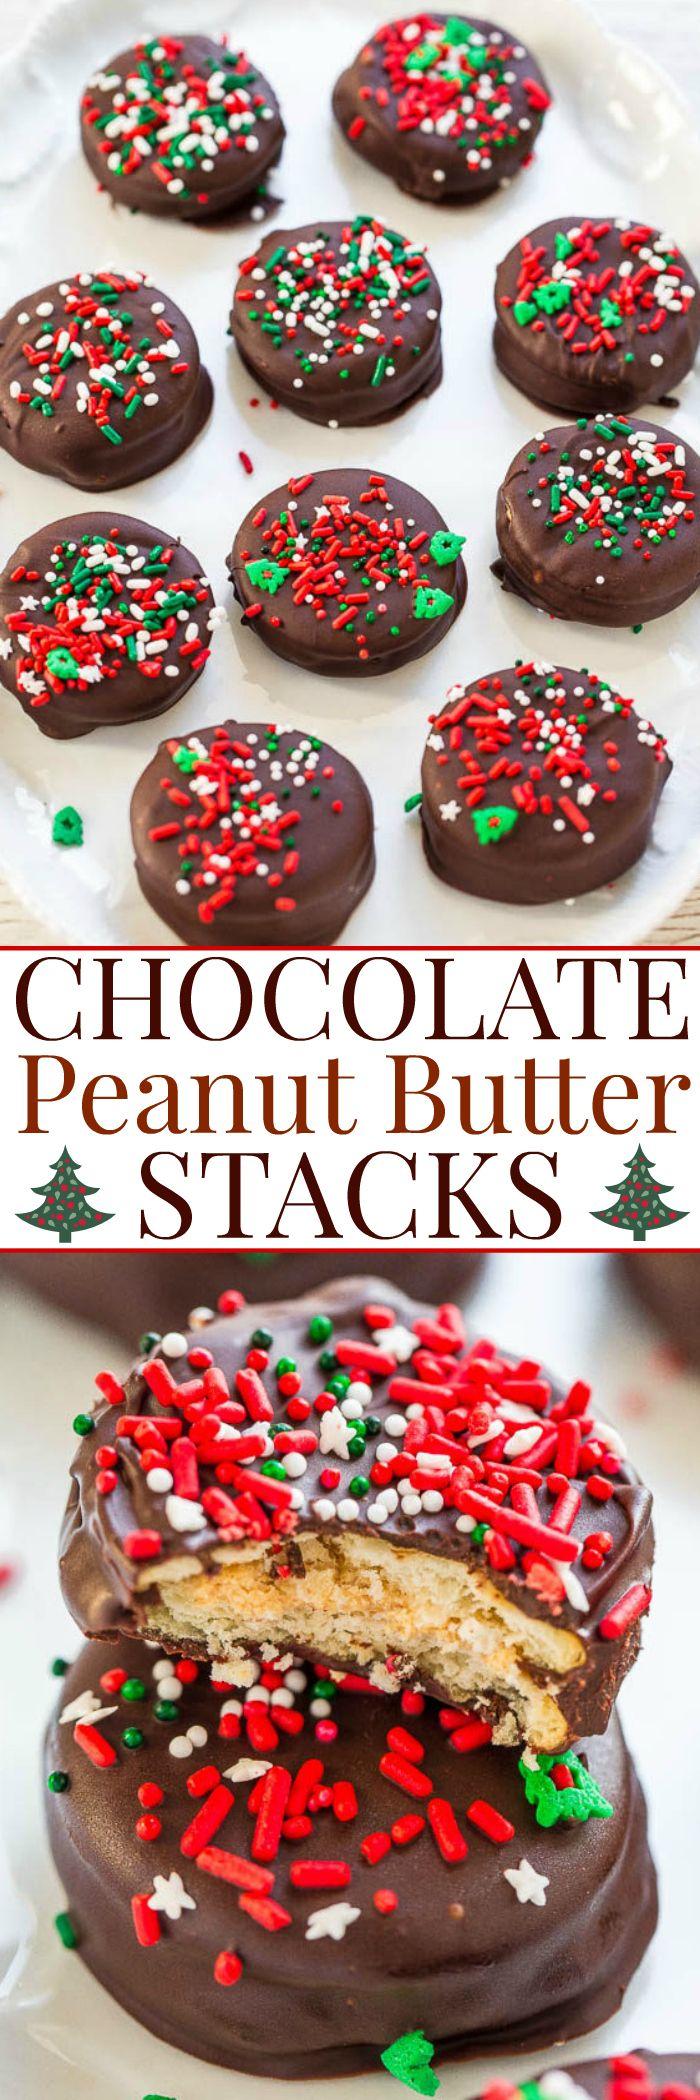 Chocolate Peanut Butter Stacks   Chocolate peanut butter, Chocolate ...